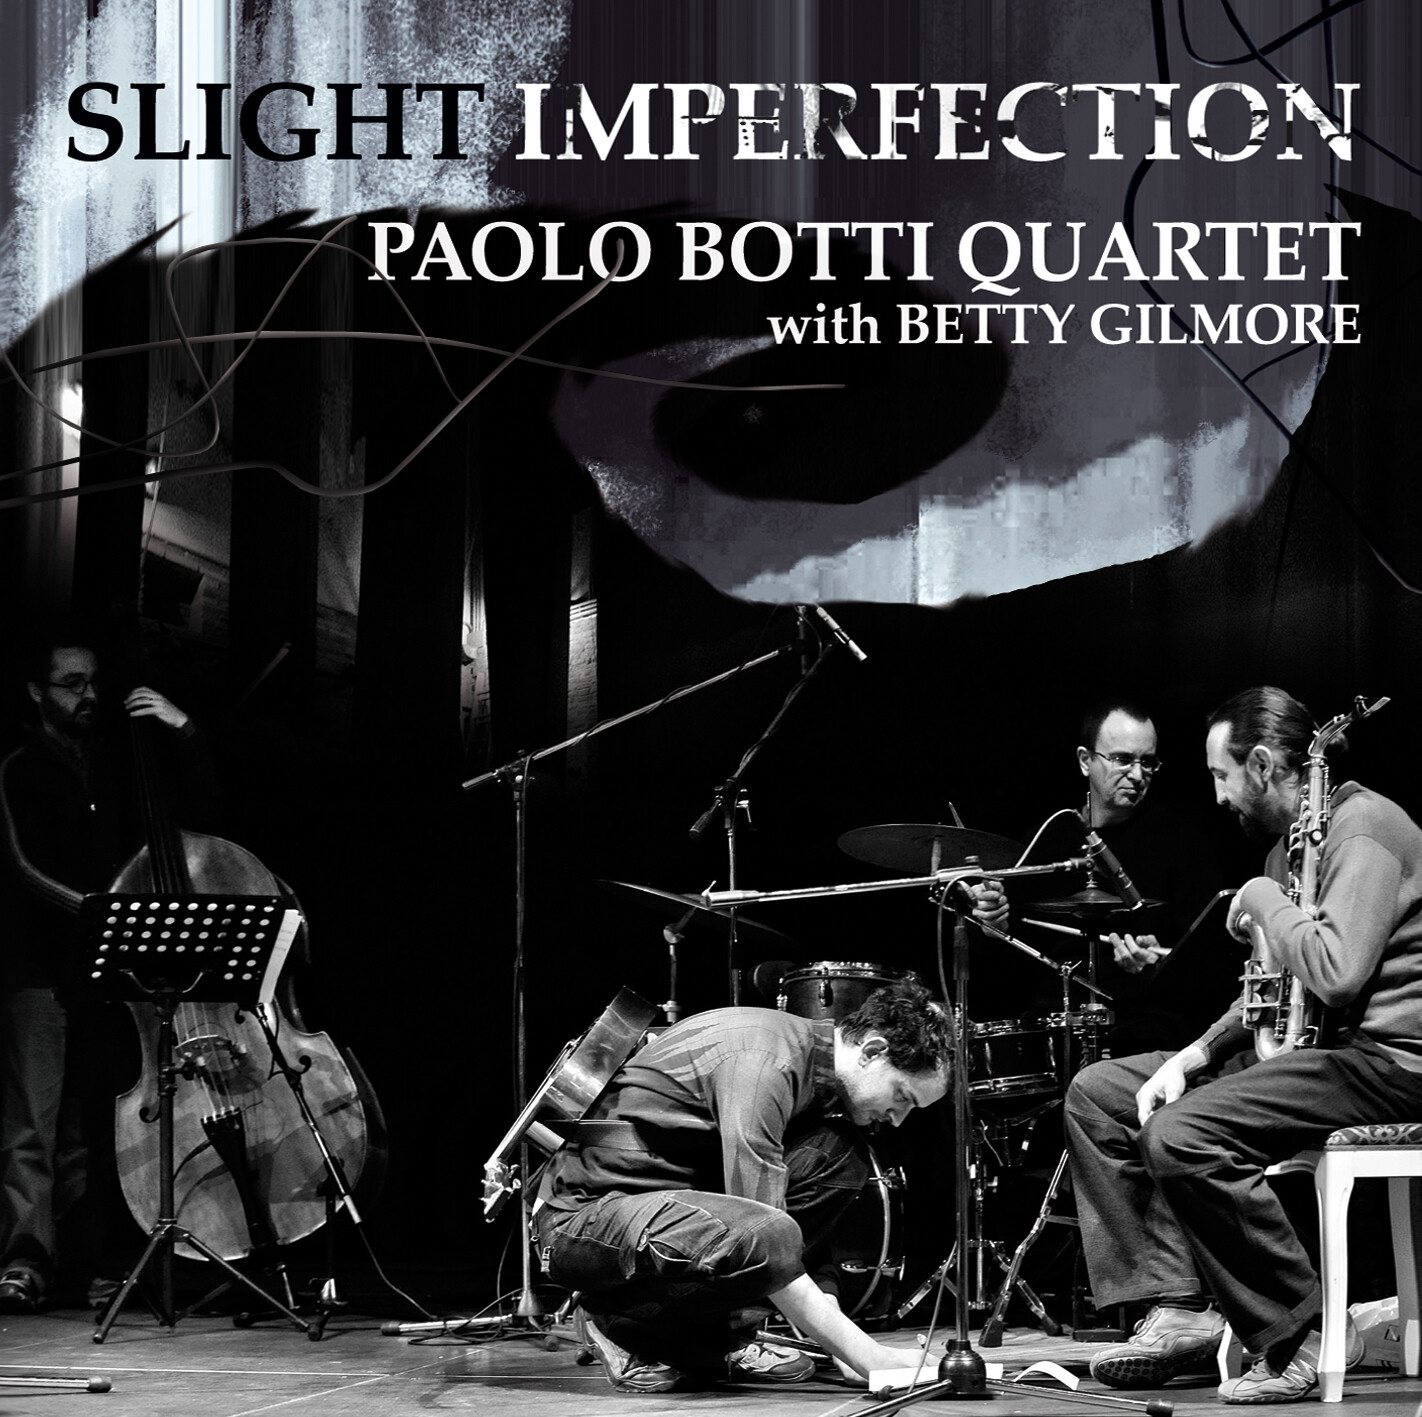 PAOLO BOTTI QUARTET & BETTY GILMORE   «Slight imperfection»